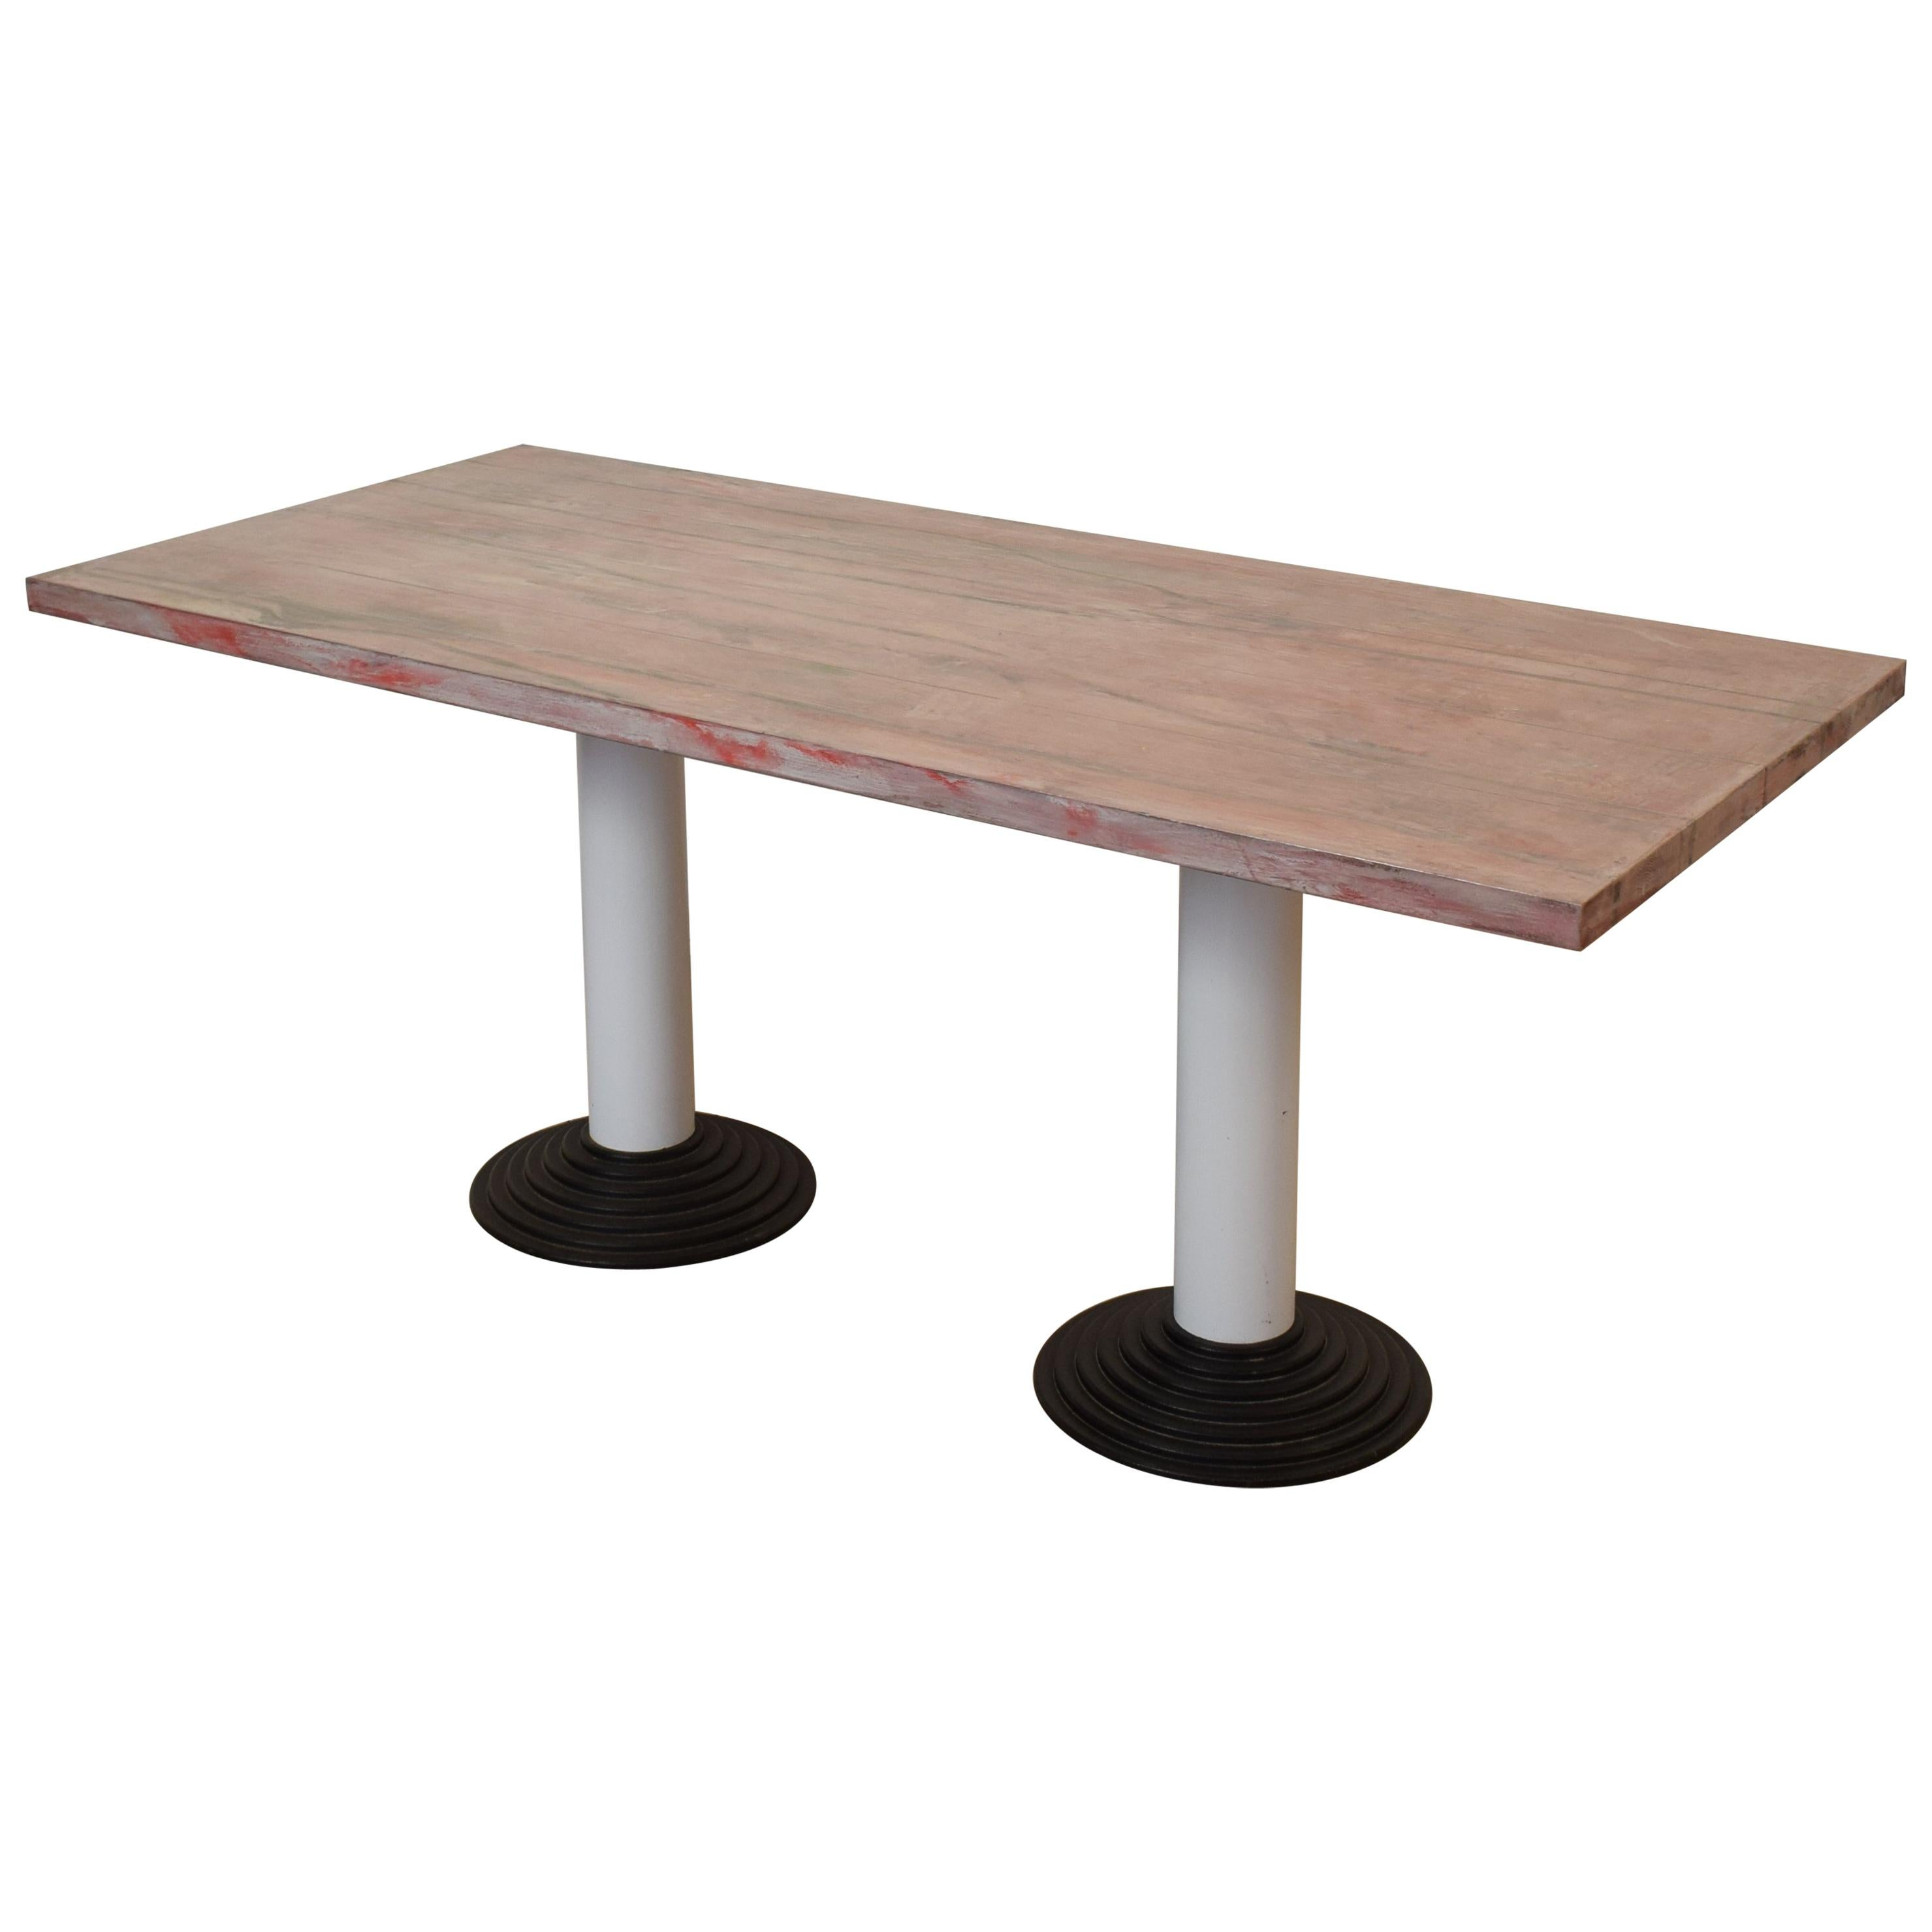 "Memphis Dining Table or Desk by Astori De Ponti ""Astragalo"" for Driade, 1982"